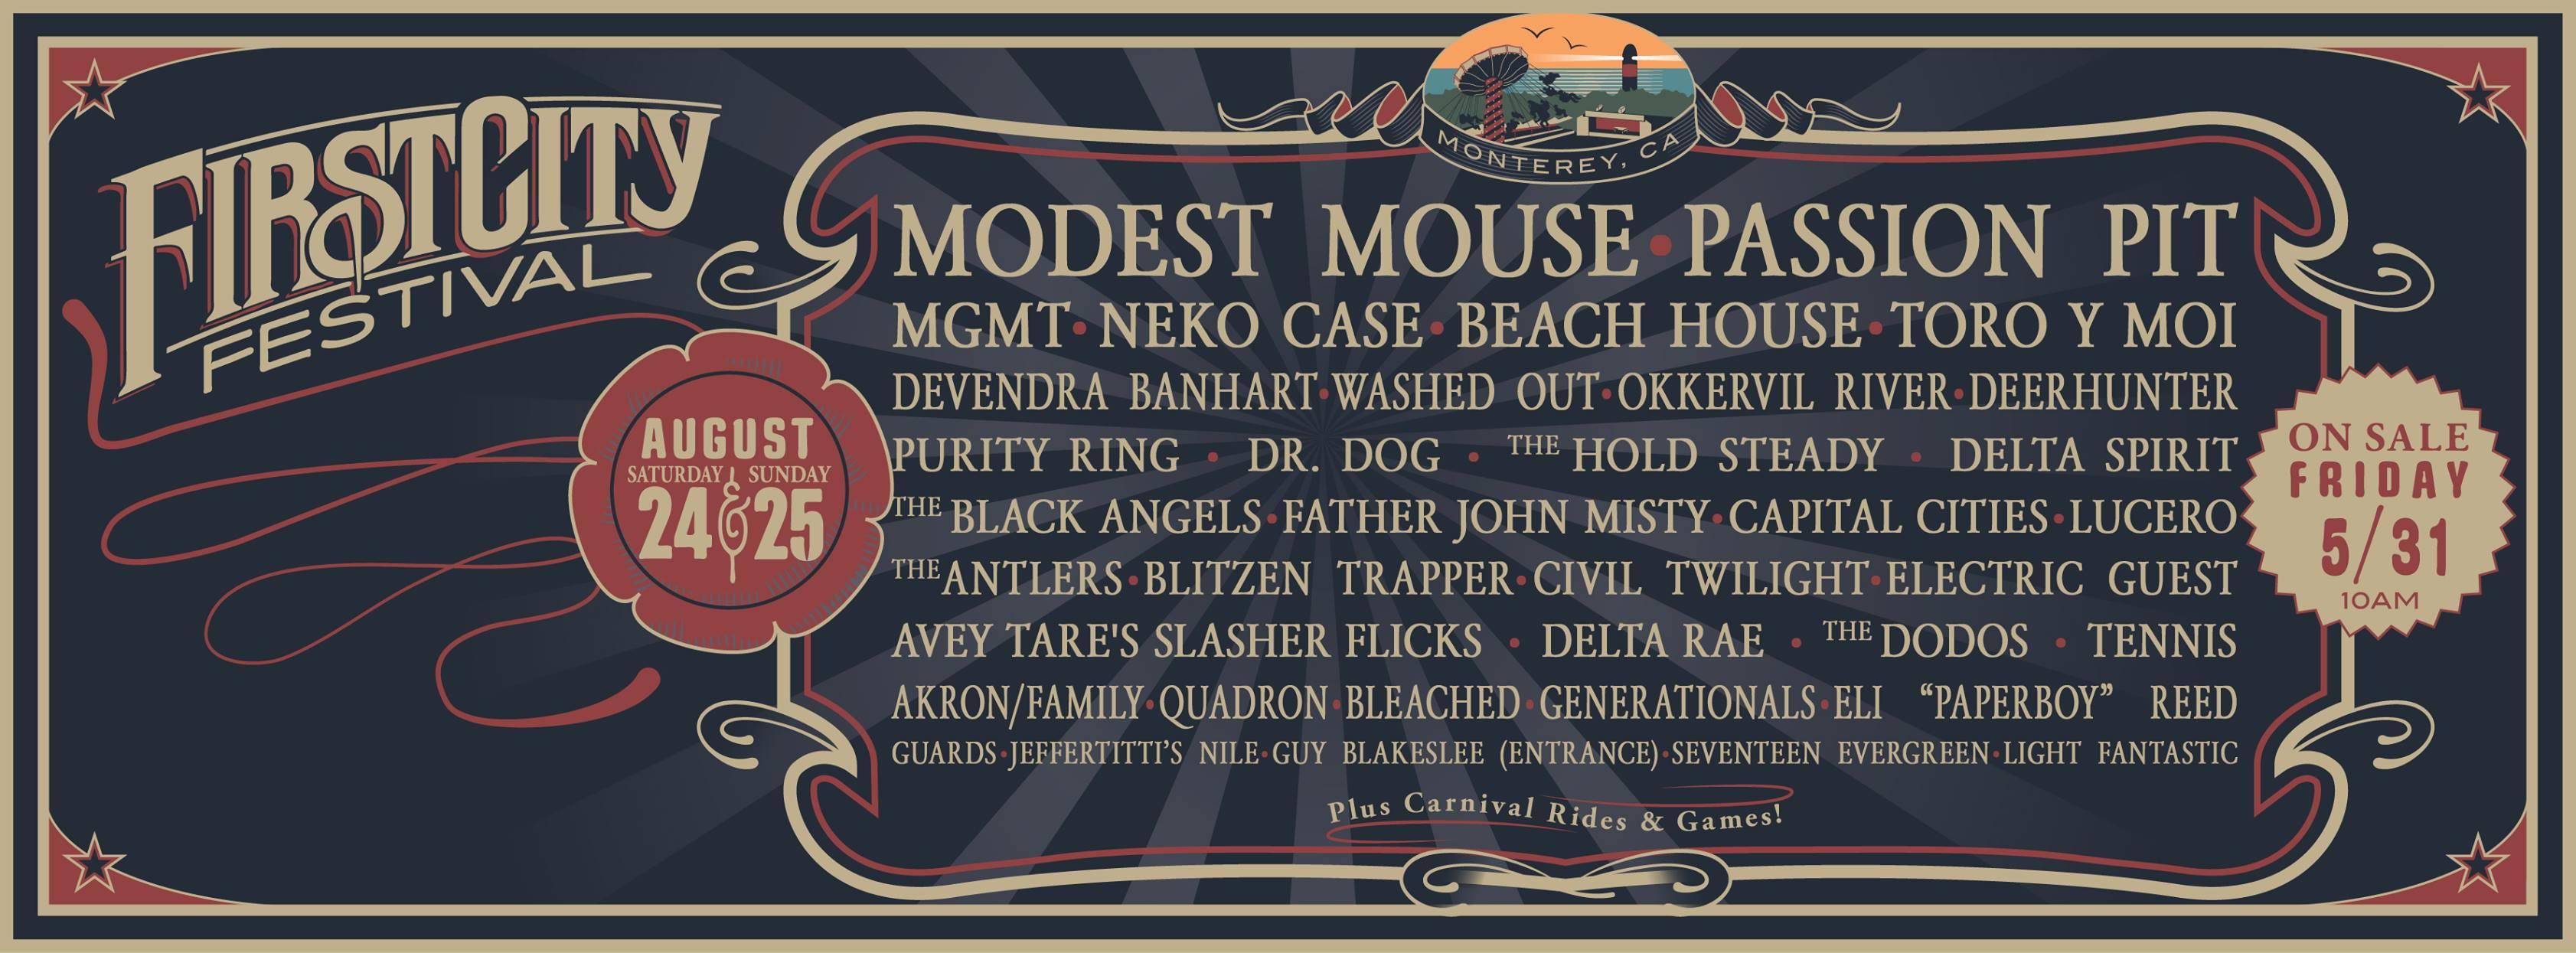 First City Festival Monterey ca tickets